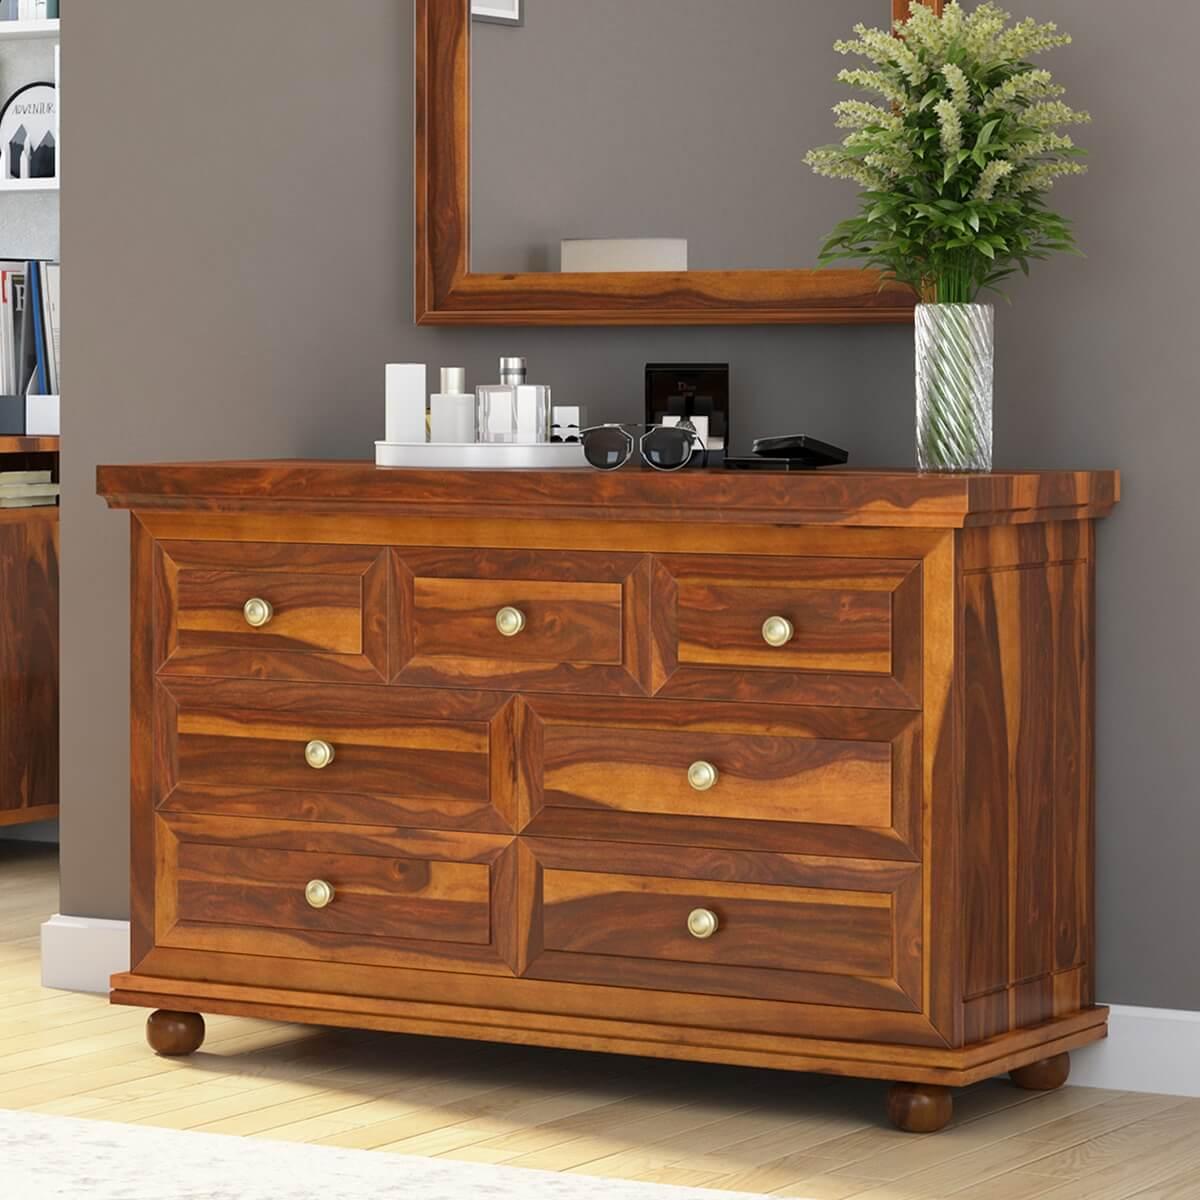 Bedroom Dressers Solid Wood Bestdressers 2019